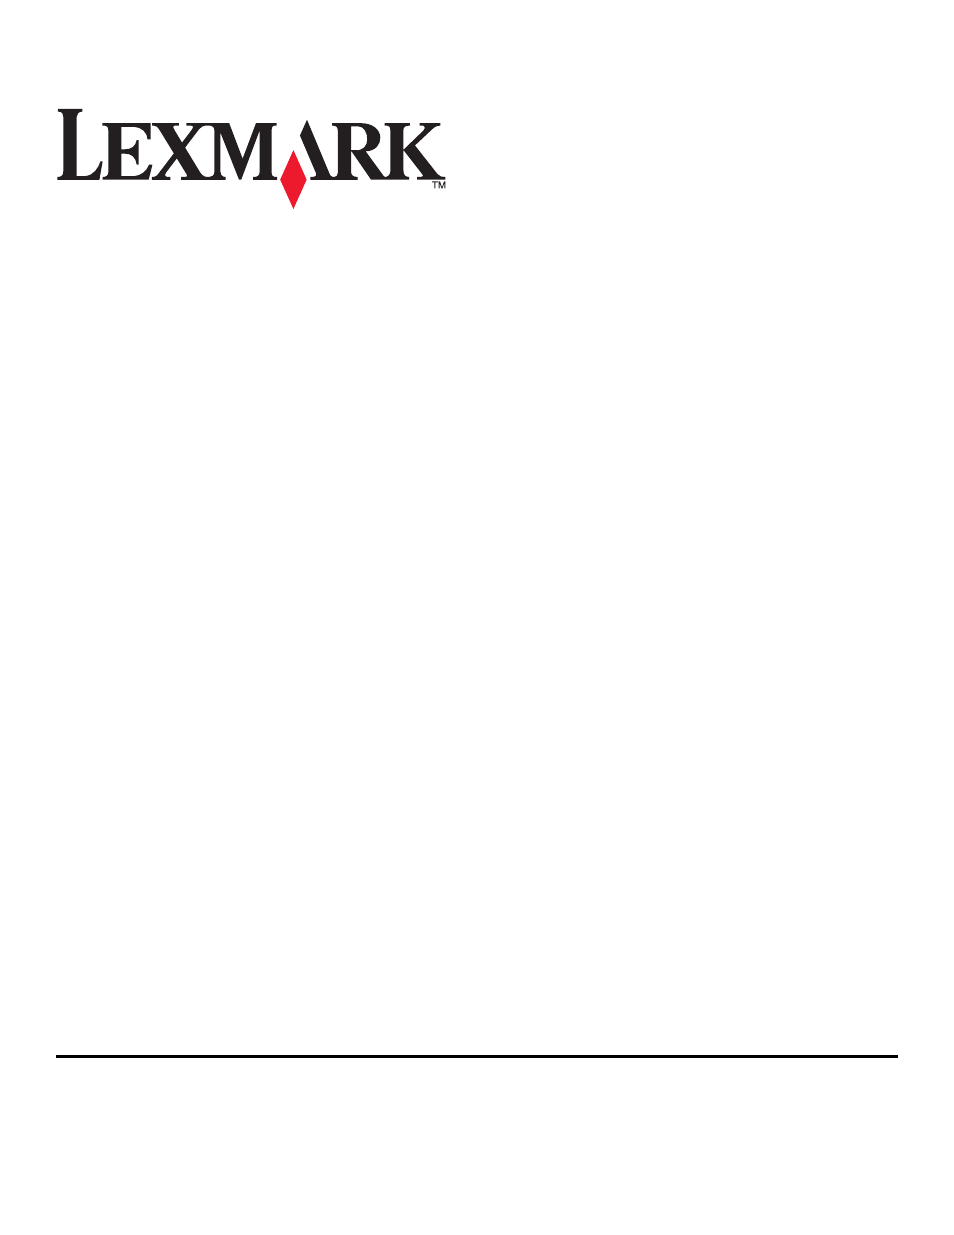 Lexmark Z2400 Driver